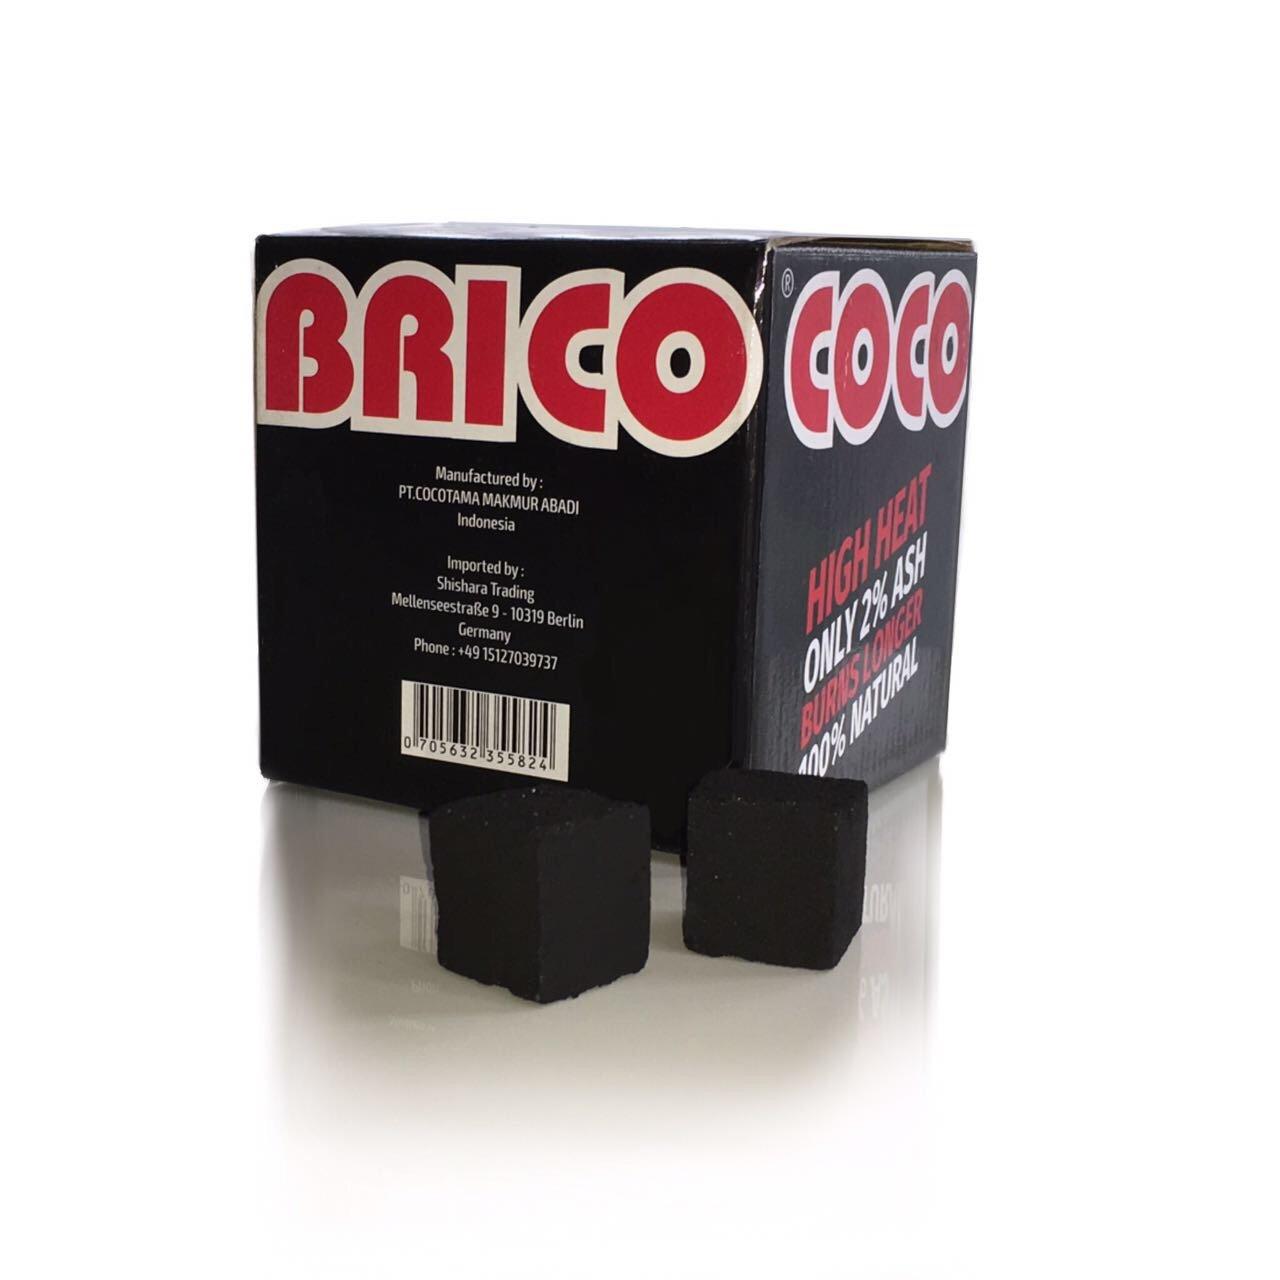 COCOBRICO - Carbone per shisha, 1 kg